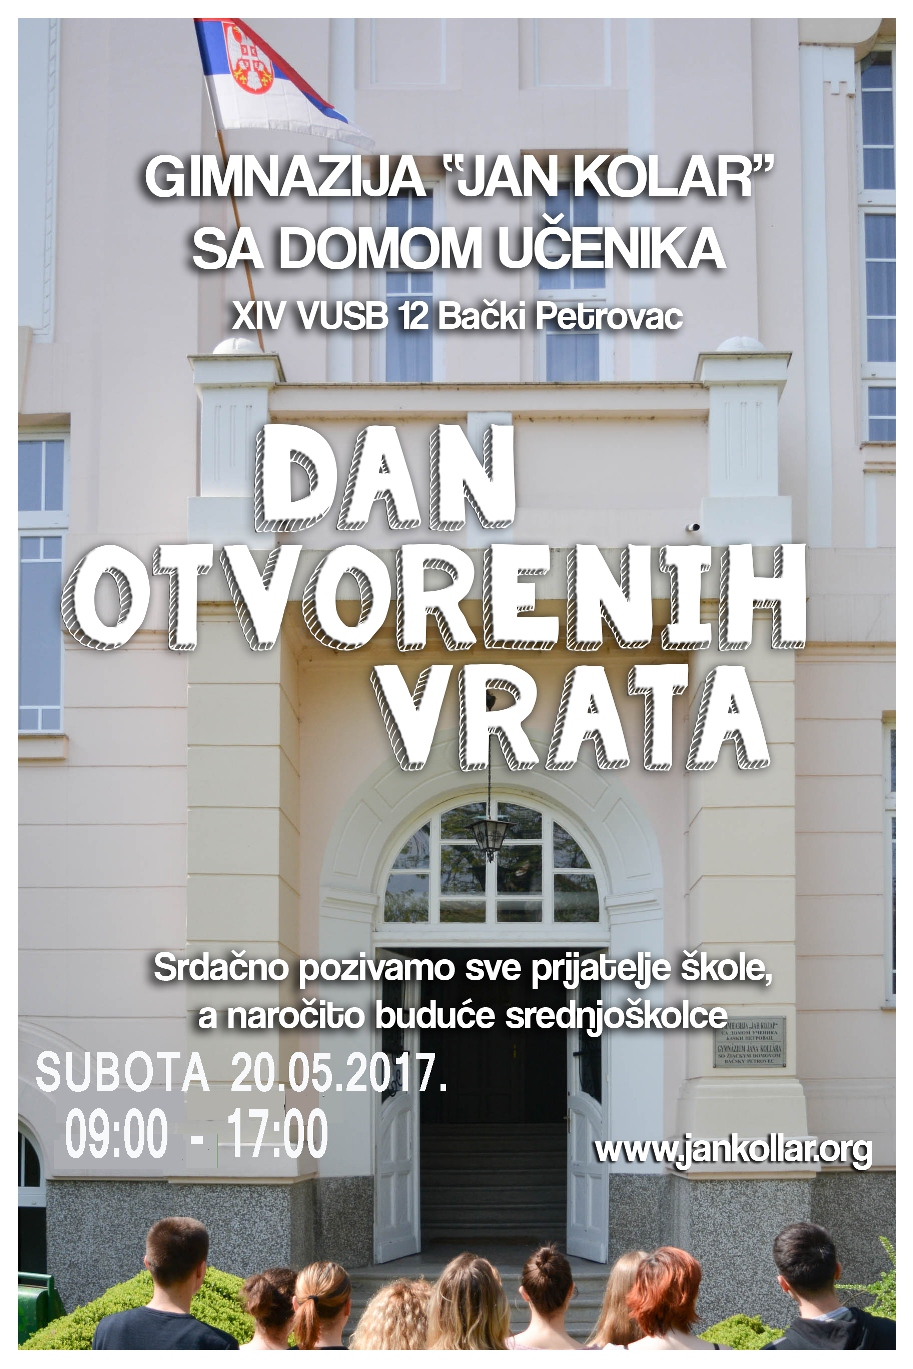 srpski plakat